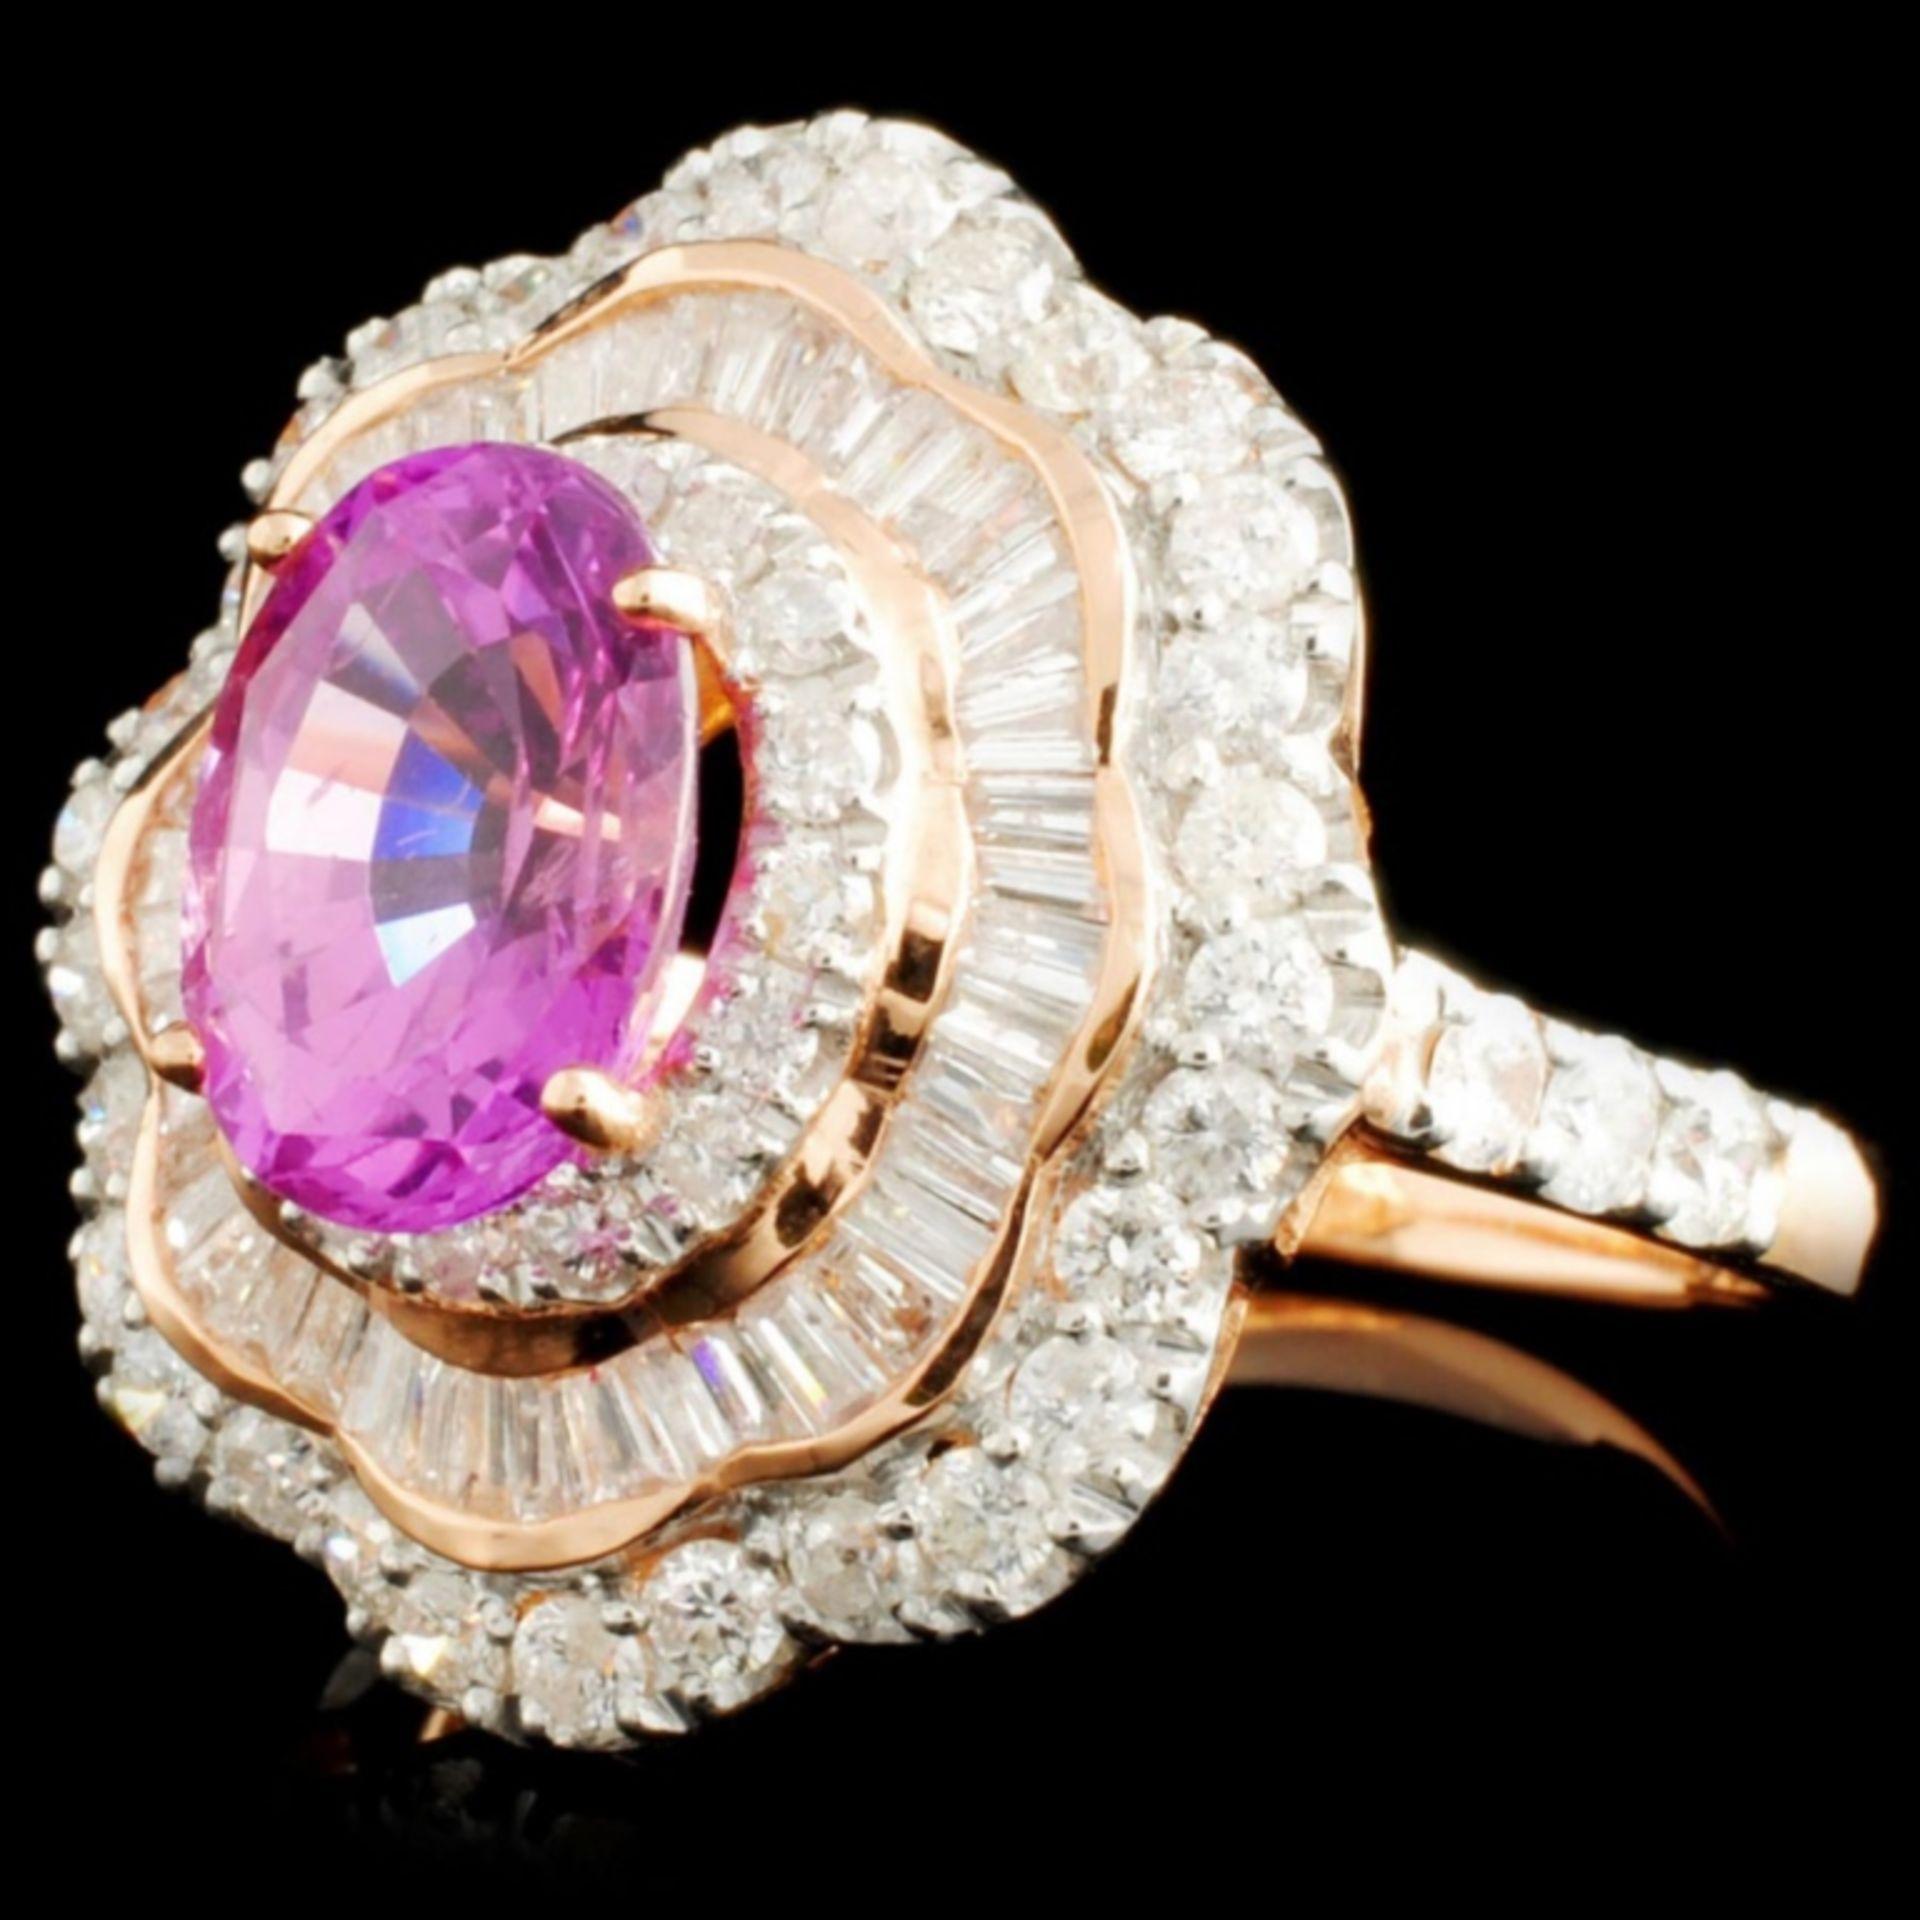 14K Gold 1.90ct Sapphire & 1.31ctw Diamond Ring - Image 2 of 5